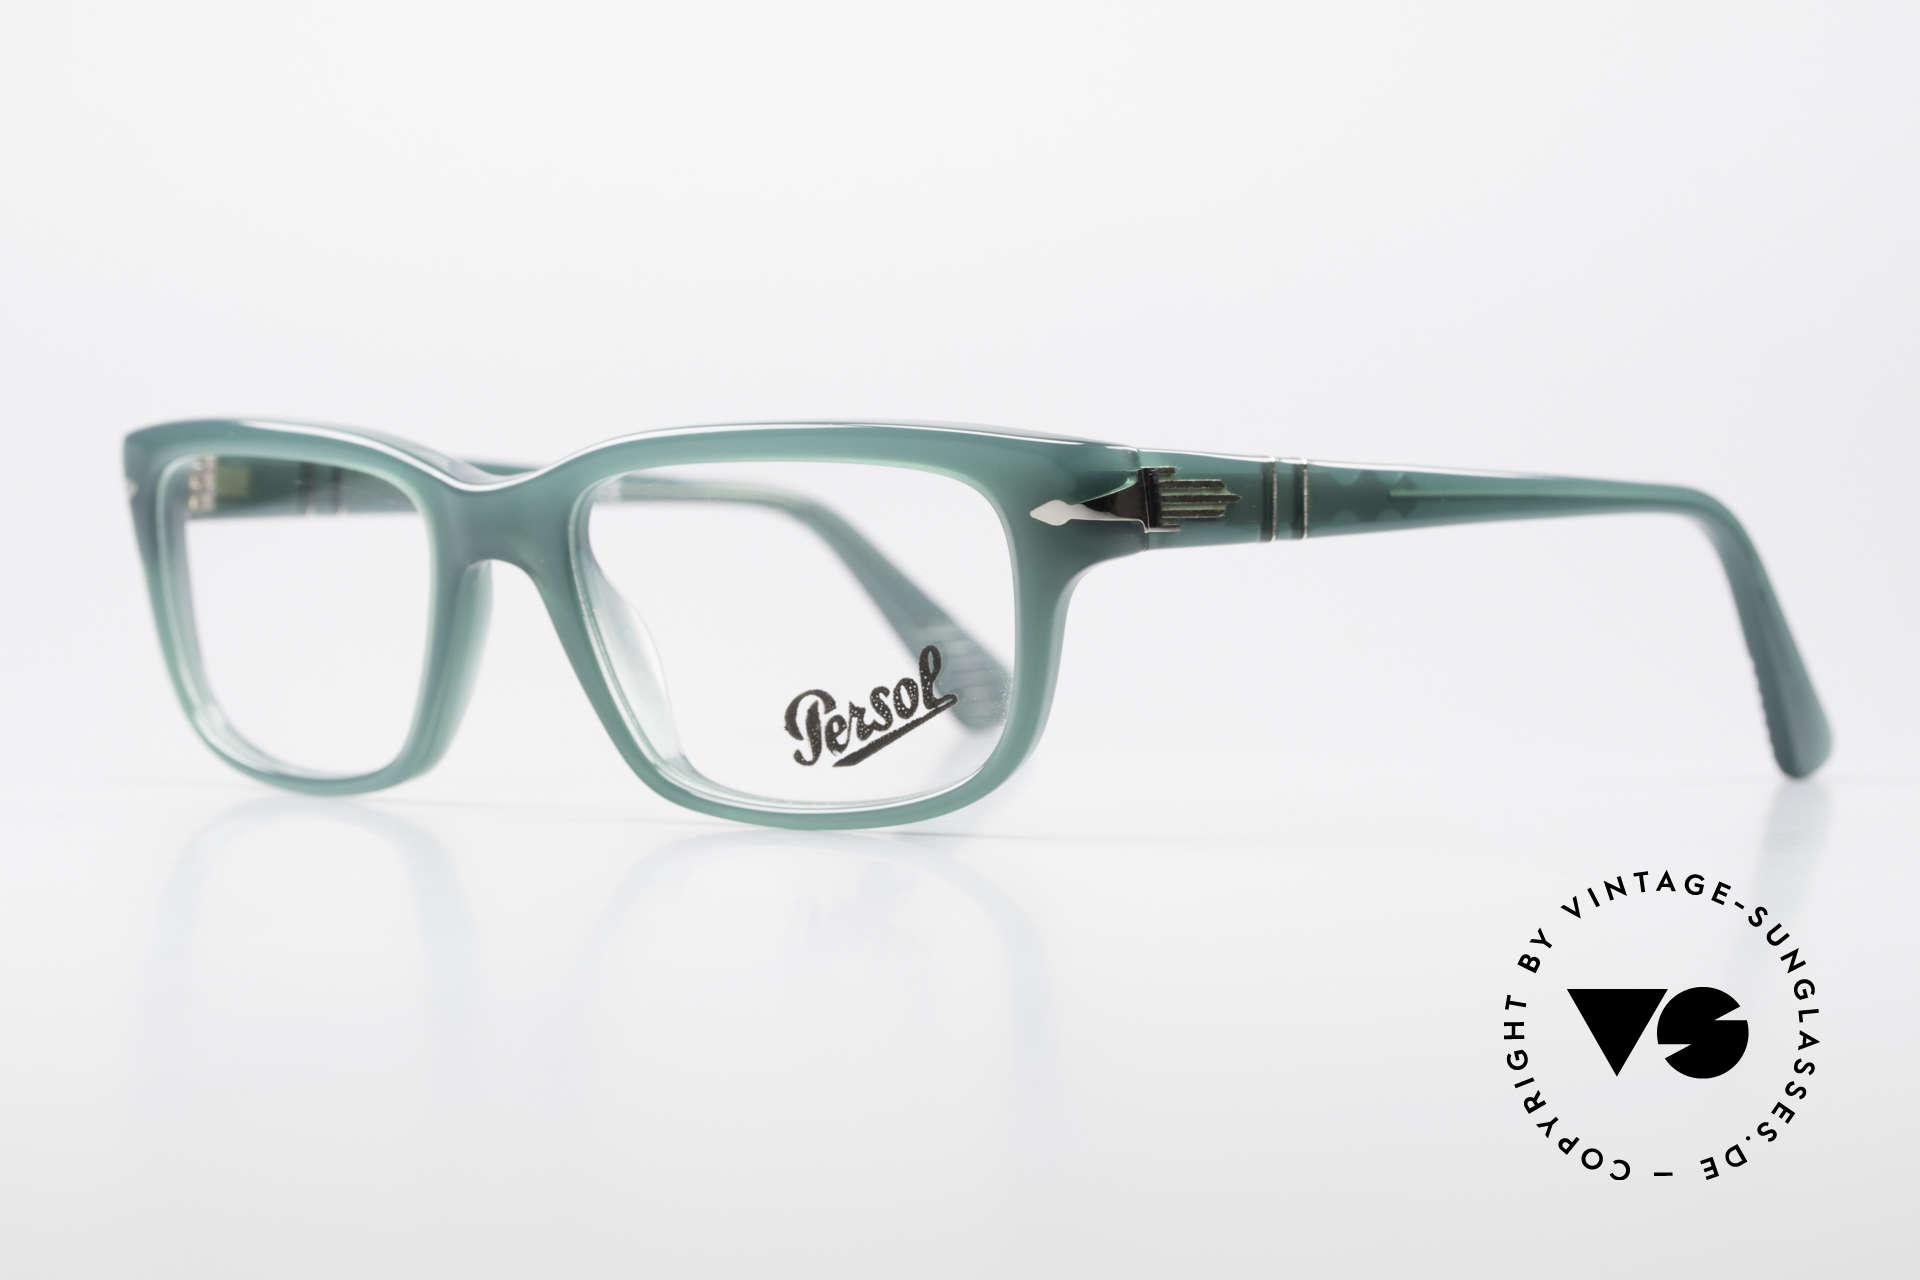 Persol 3073 Film Noir Edition Eyeglasses, unworn (like all our classic PERSOL eyeglasses), Made for Men